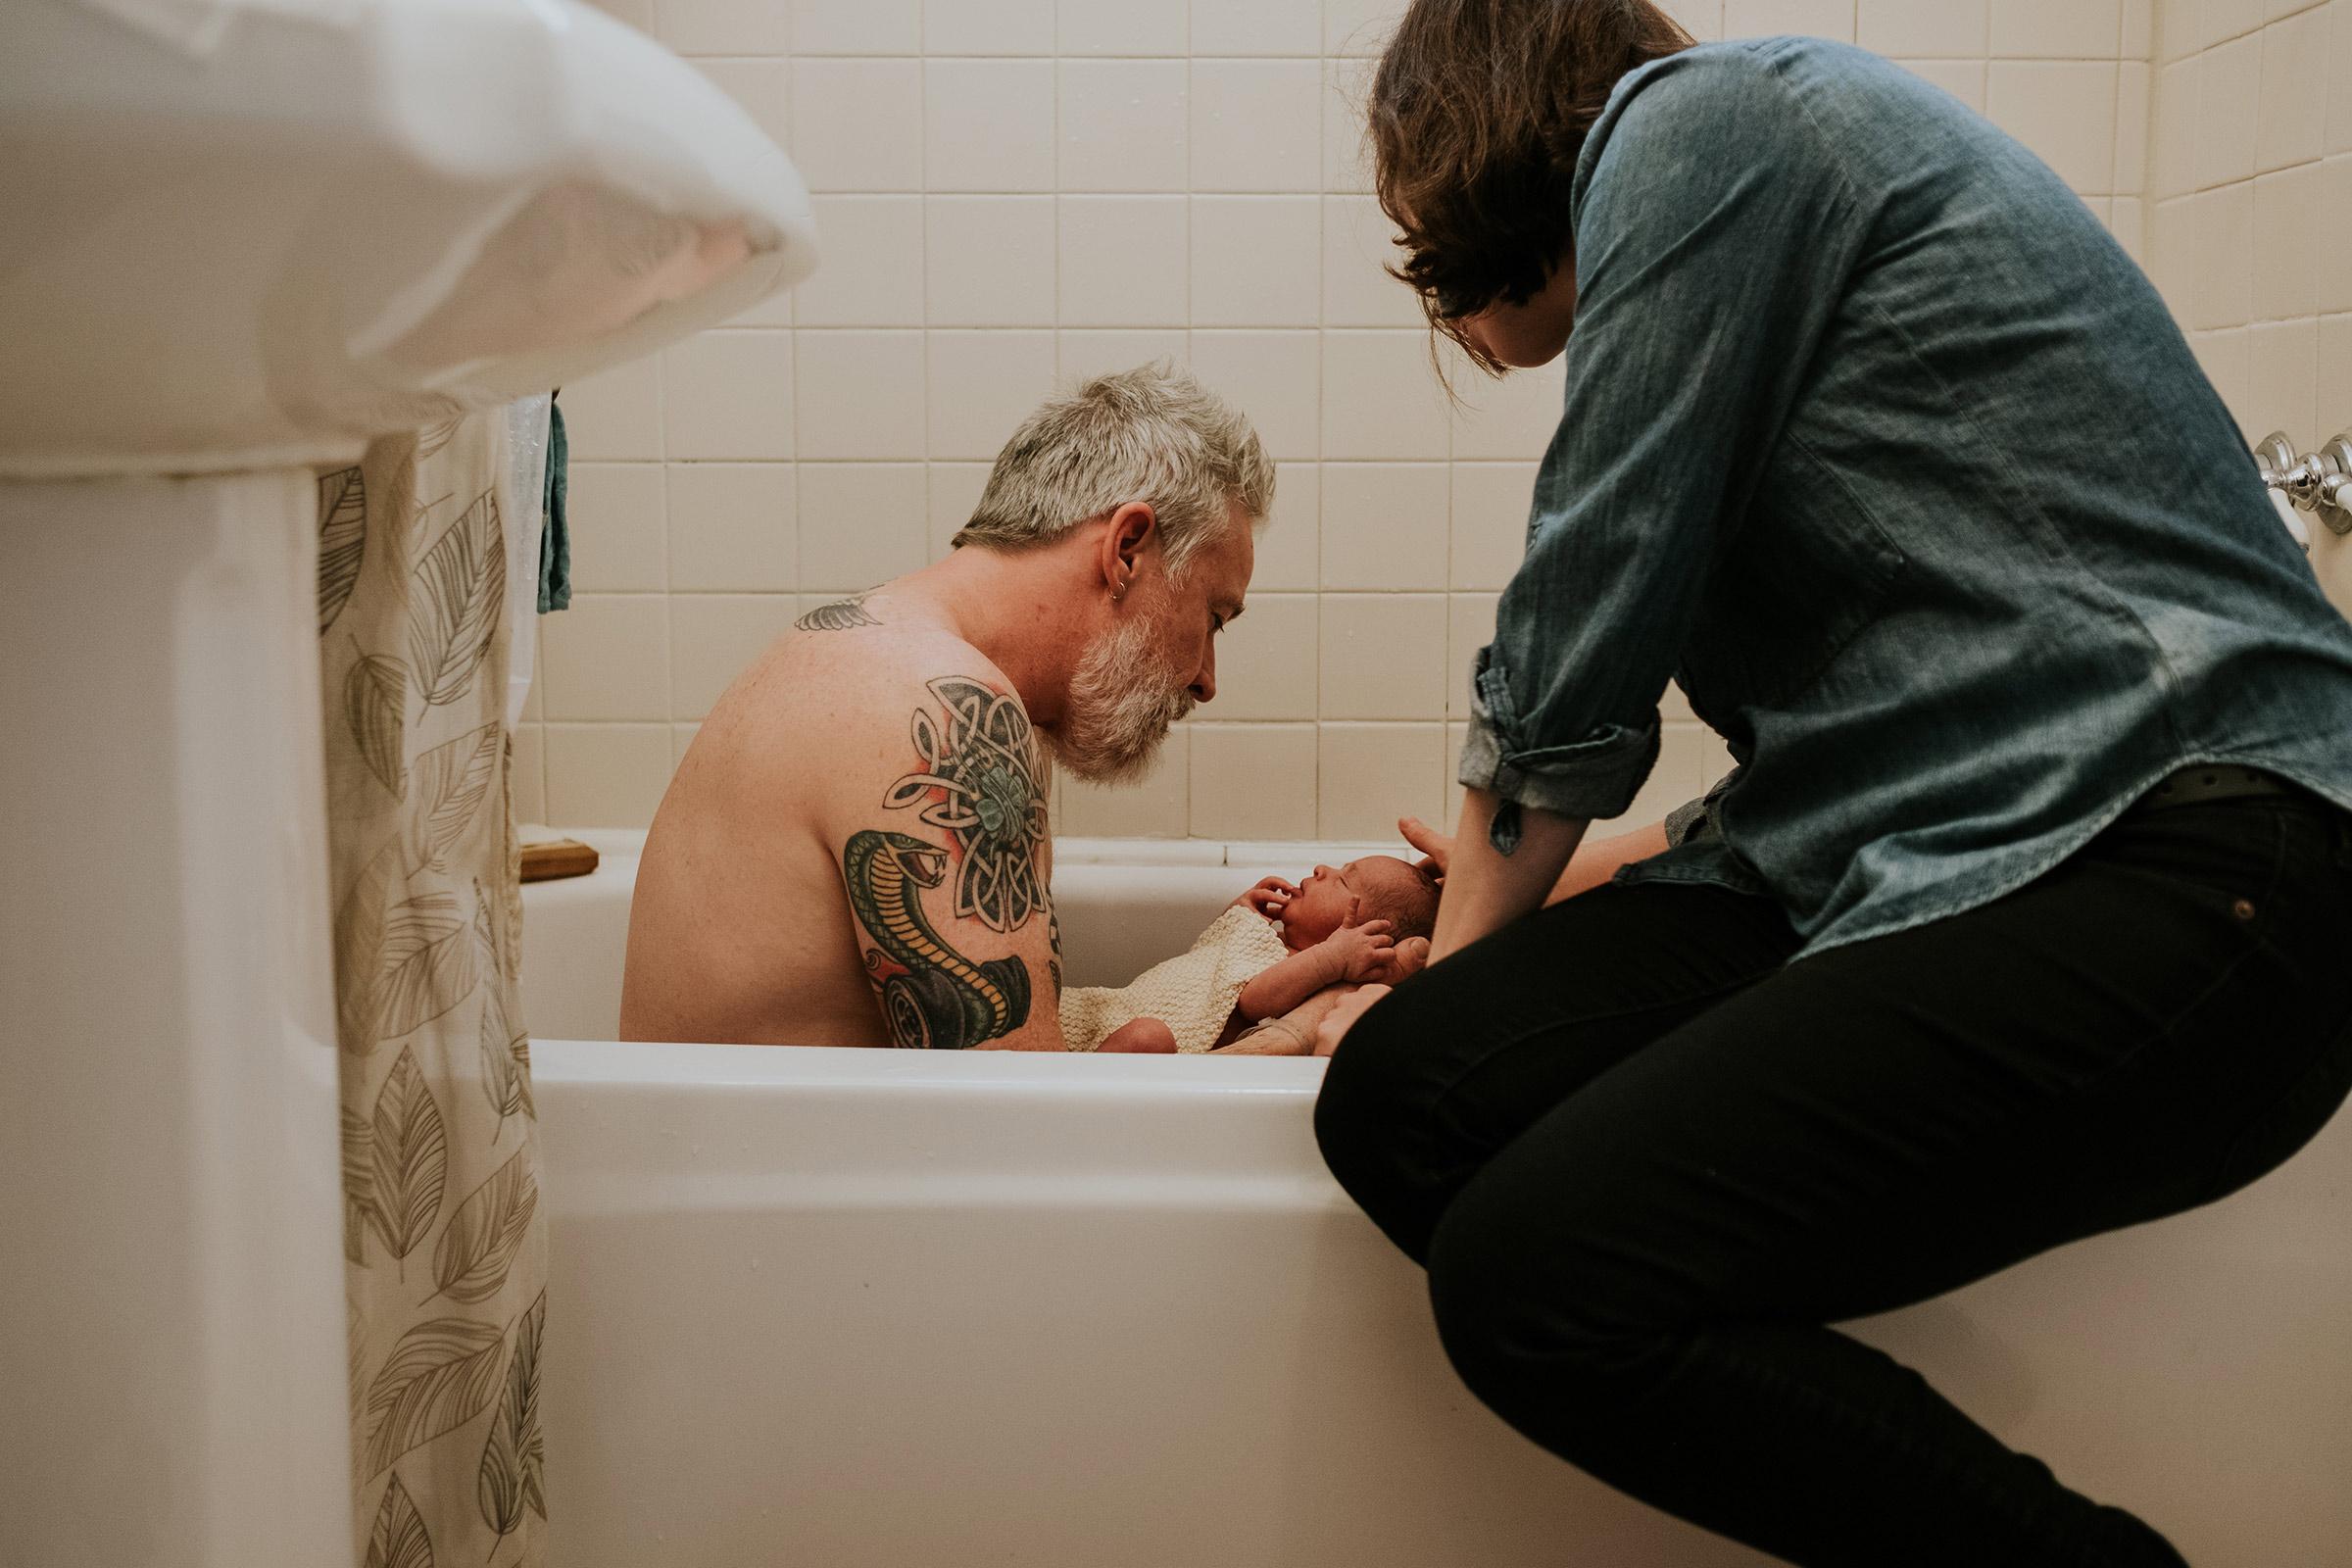 baby-rufus-and-dad-first-bath-newborn-portrait-photographer-raelyn-ramey-photography-Des-Moines-Iowa.jpg